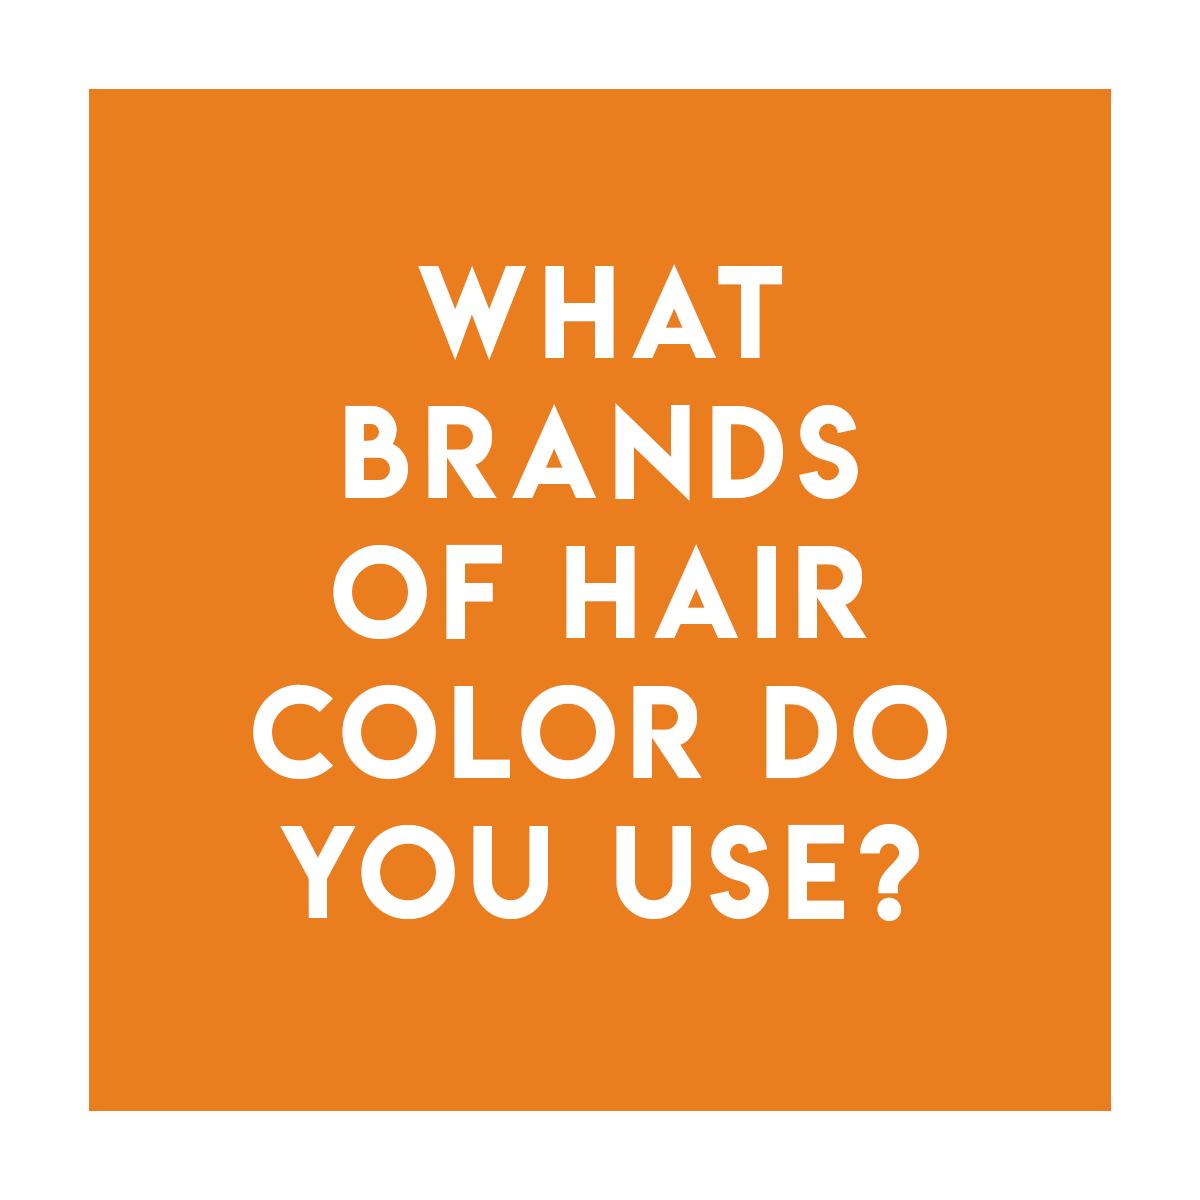 Color - L'Oreal ProfessionalDia RichesseDia LightInoa (Ammonia Free)MajirelColorfulGoldwellTopChicColorance